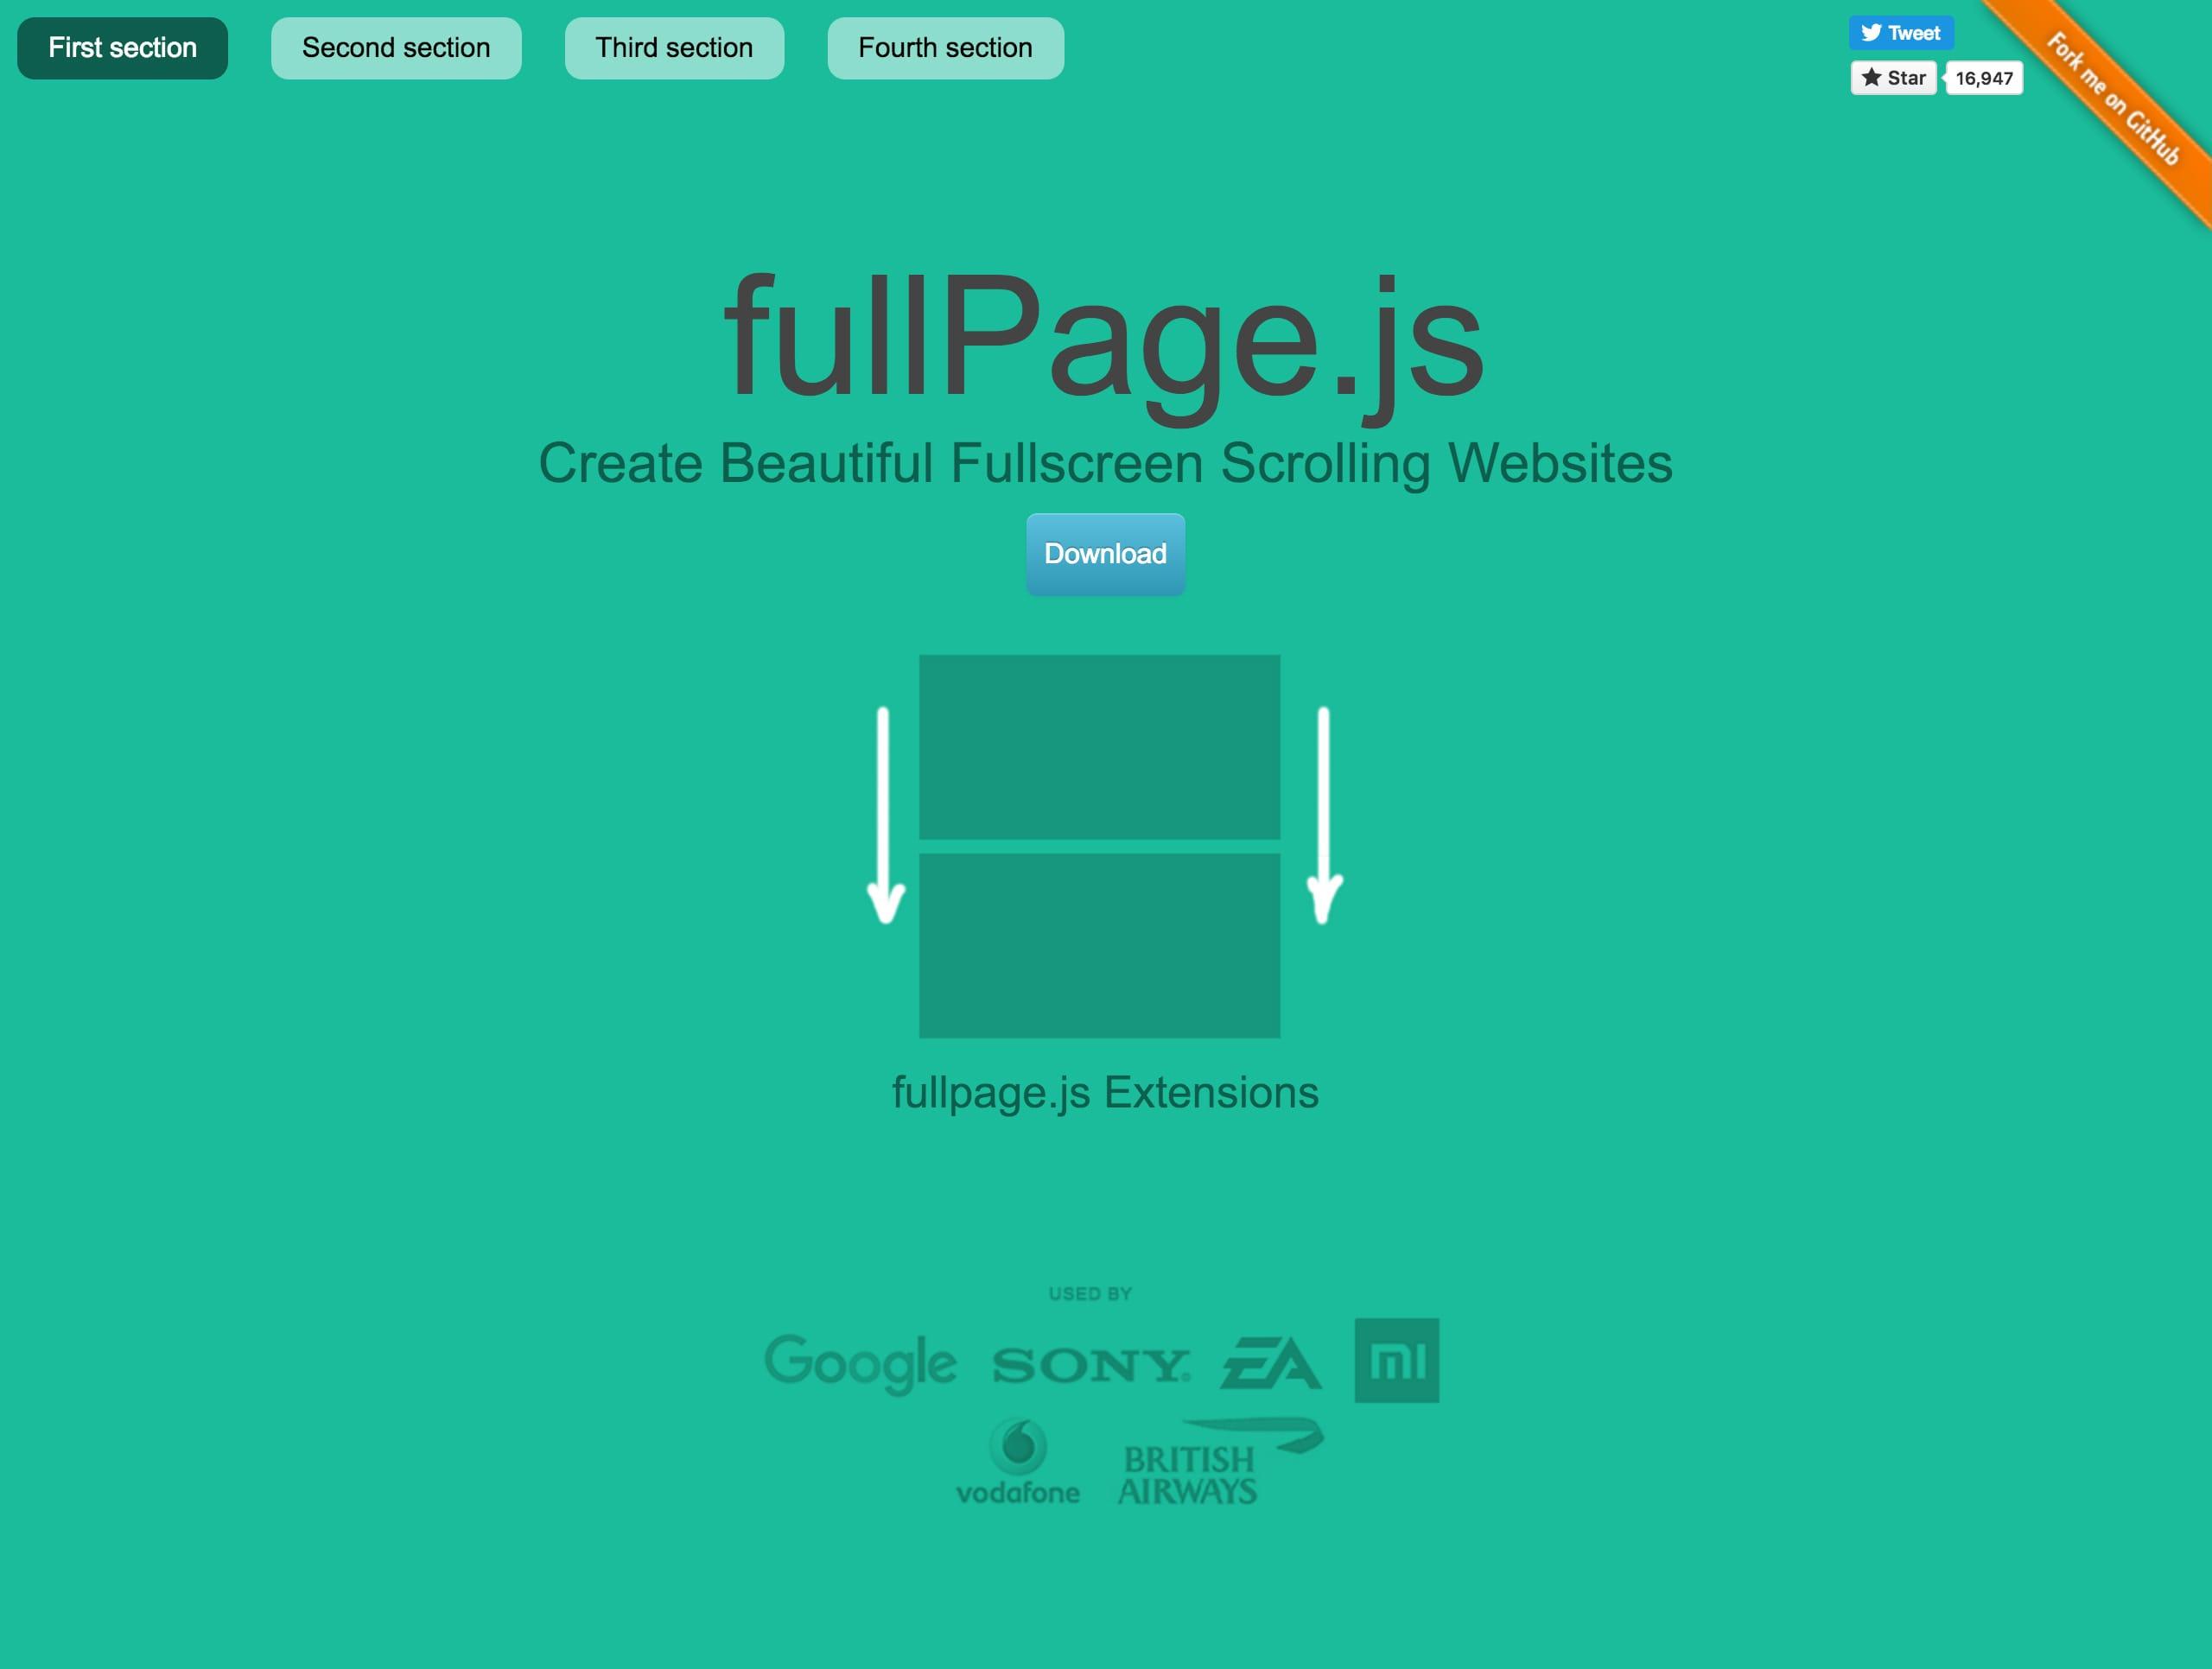 fullPage-js